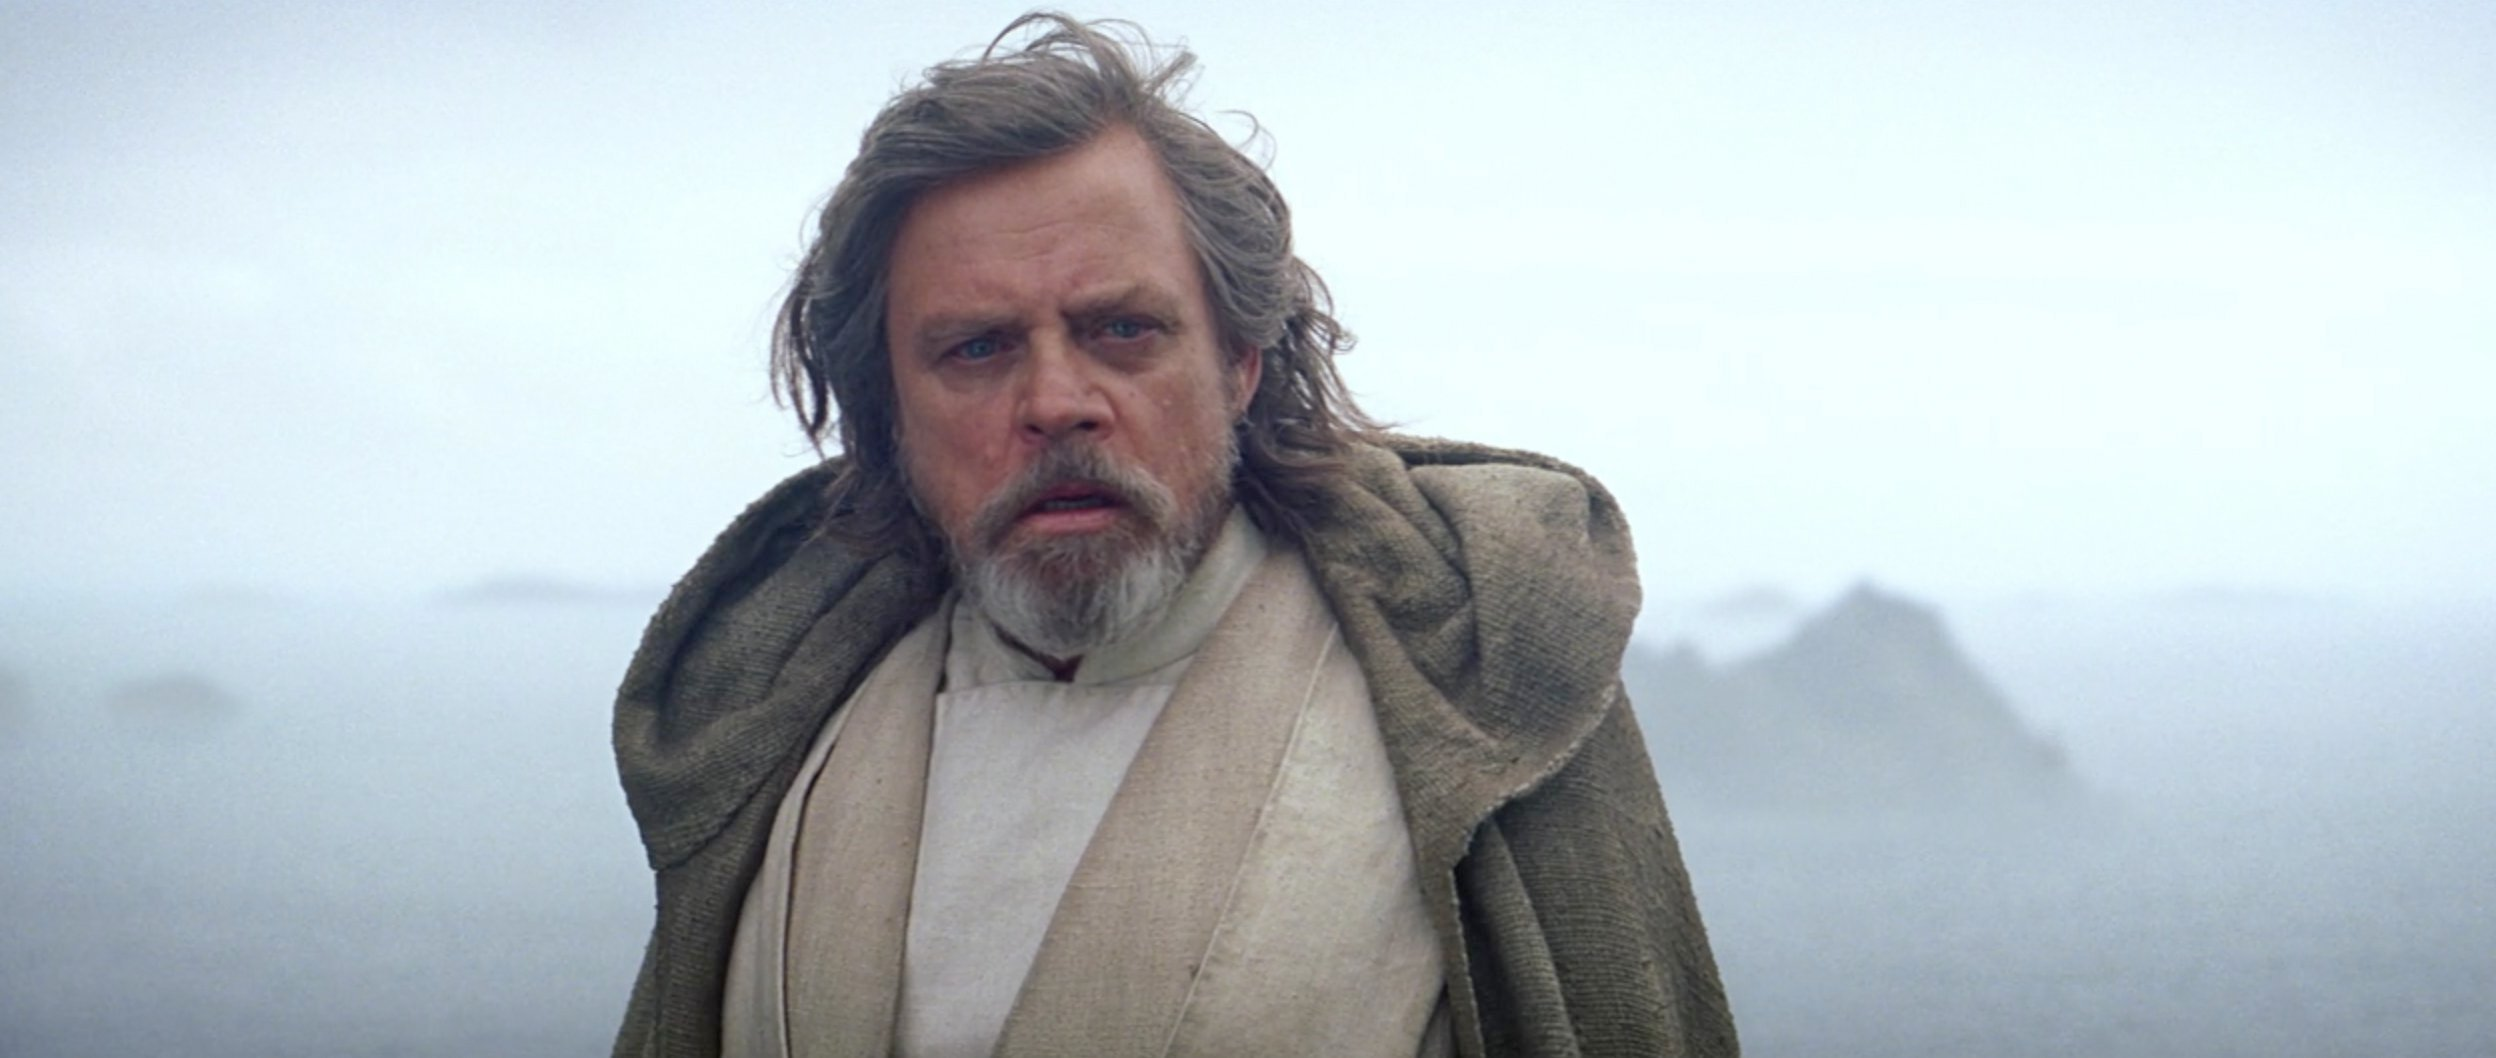 Mark Hamill, Solo: A Star Wars Story, Star Wars: The Last Jedi, Star Wars: Episode 9, Star Wars: Episode IX